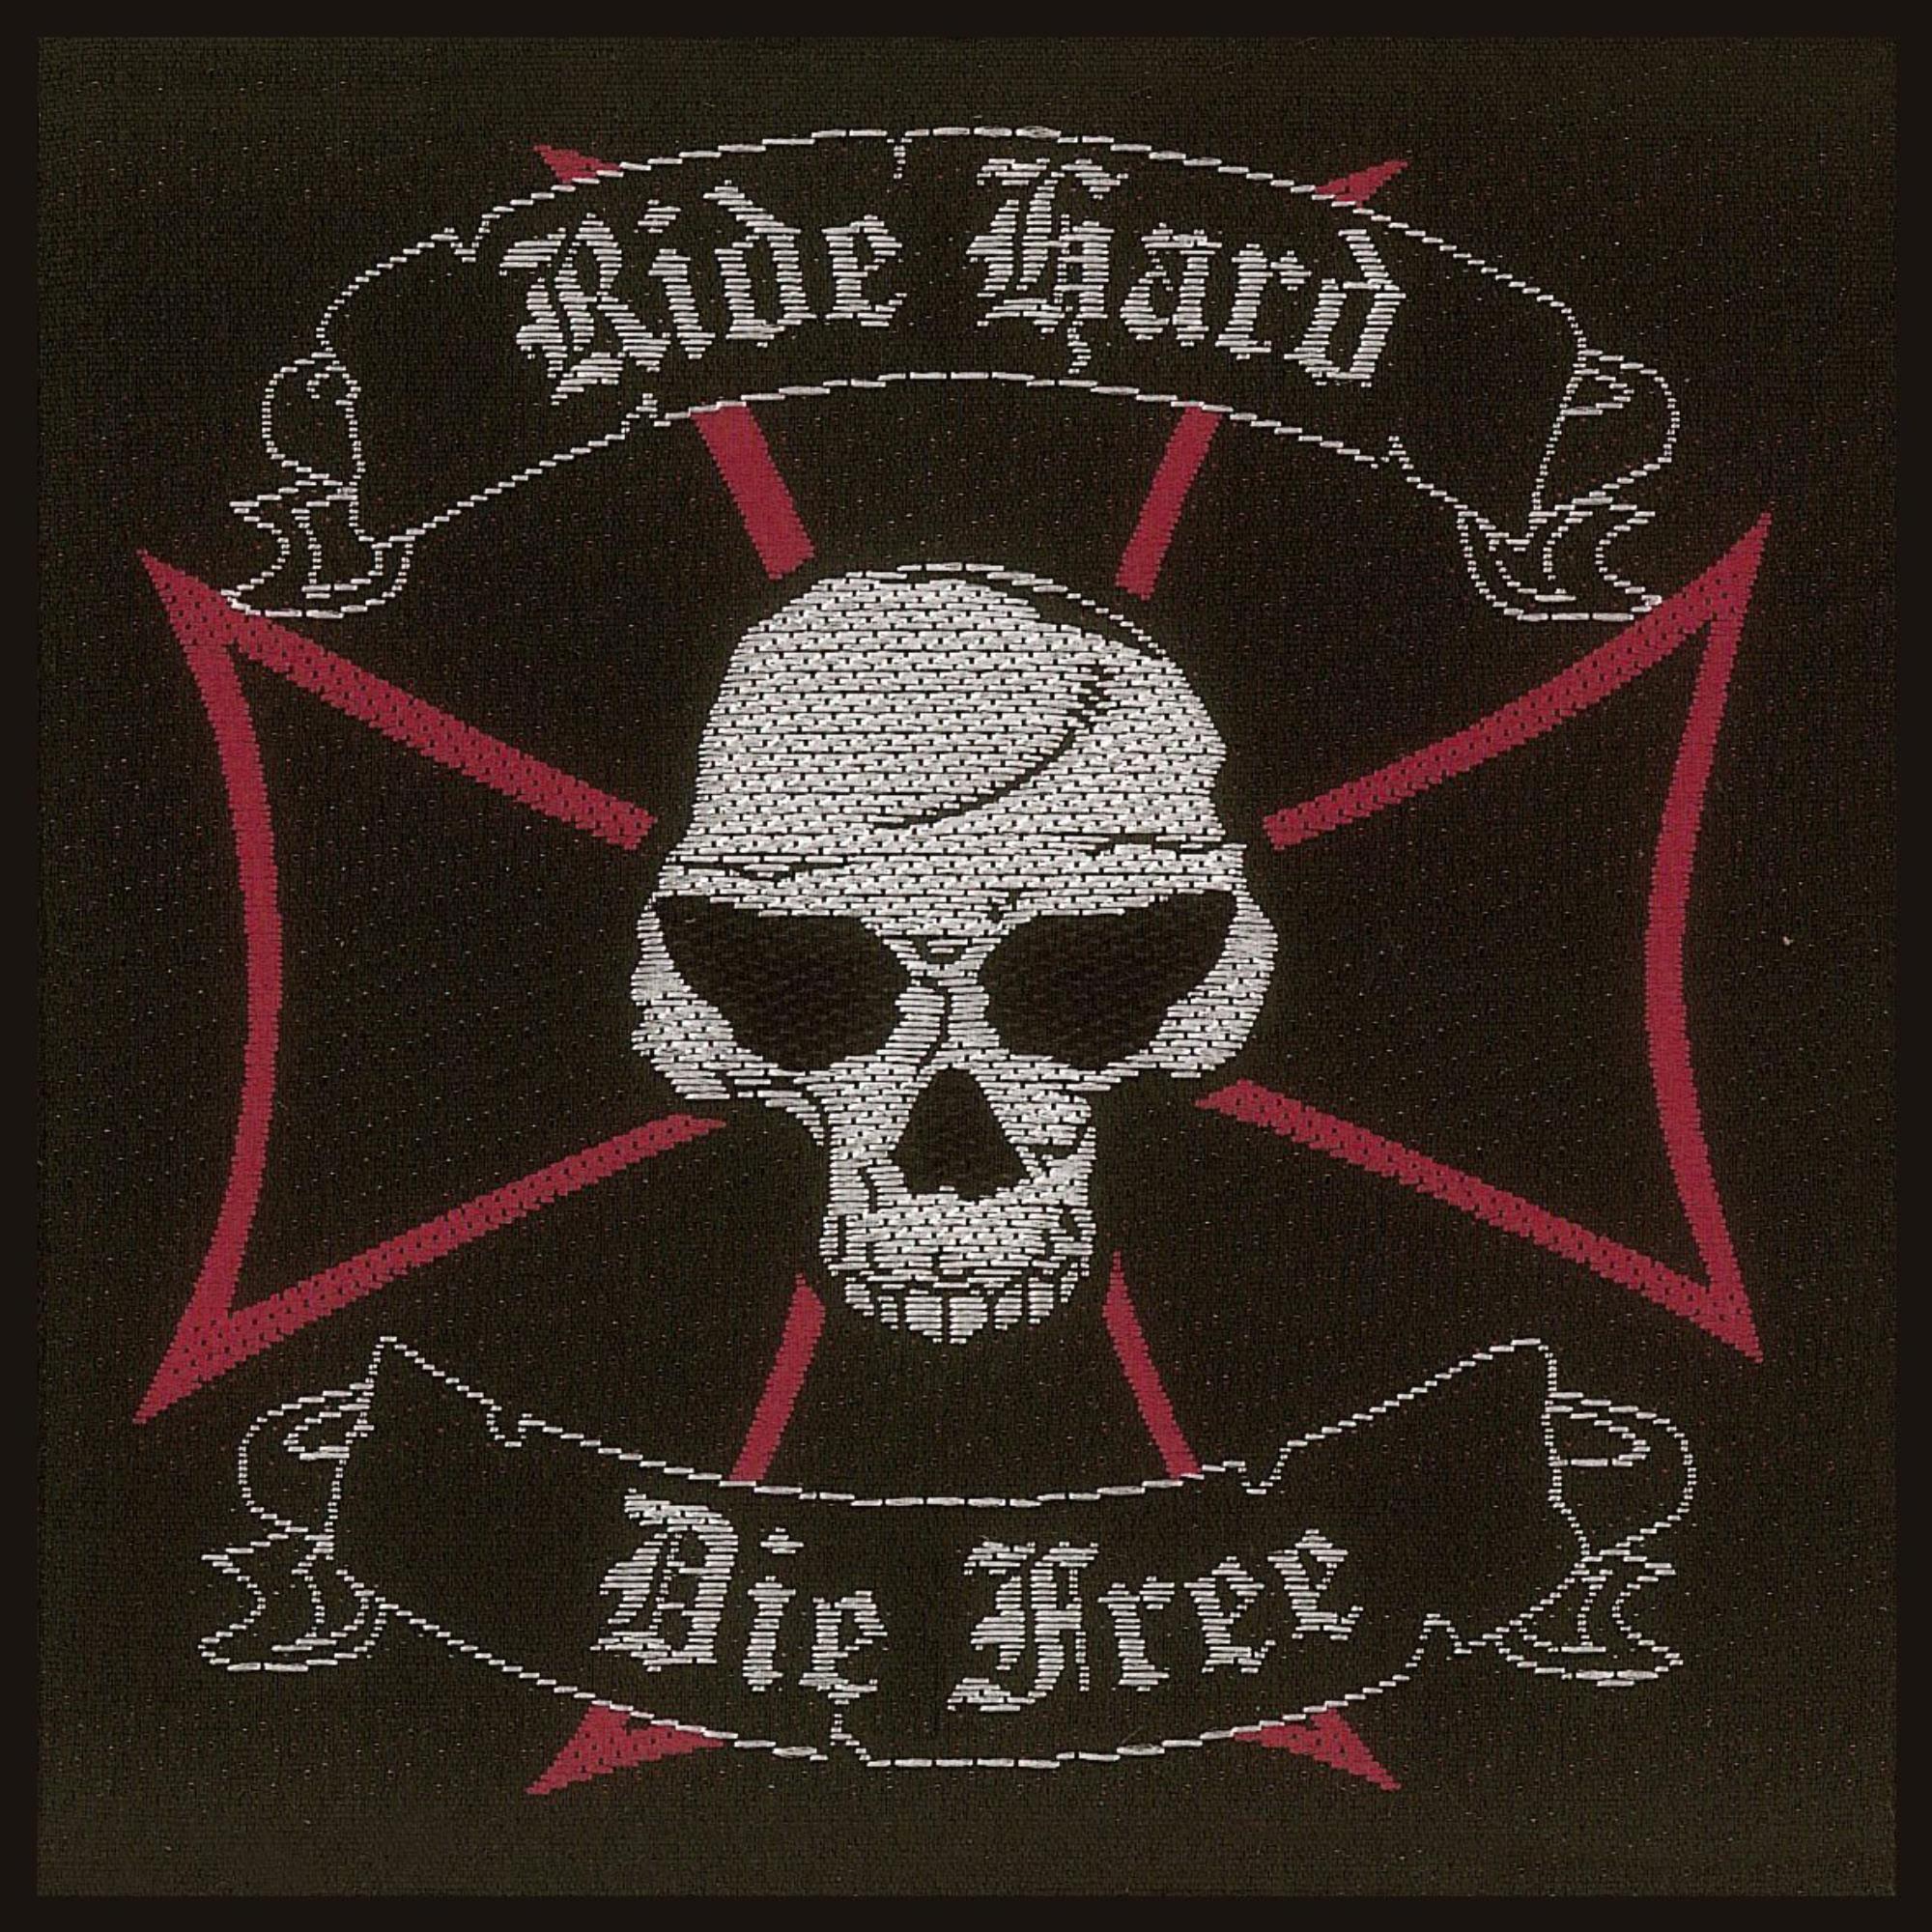 Ride Hard Die Free Patch